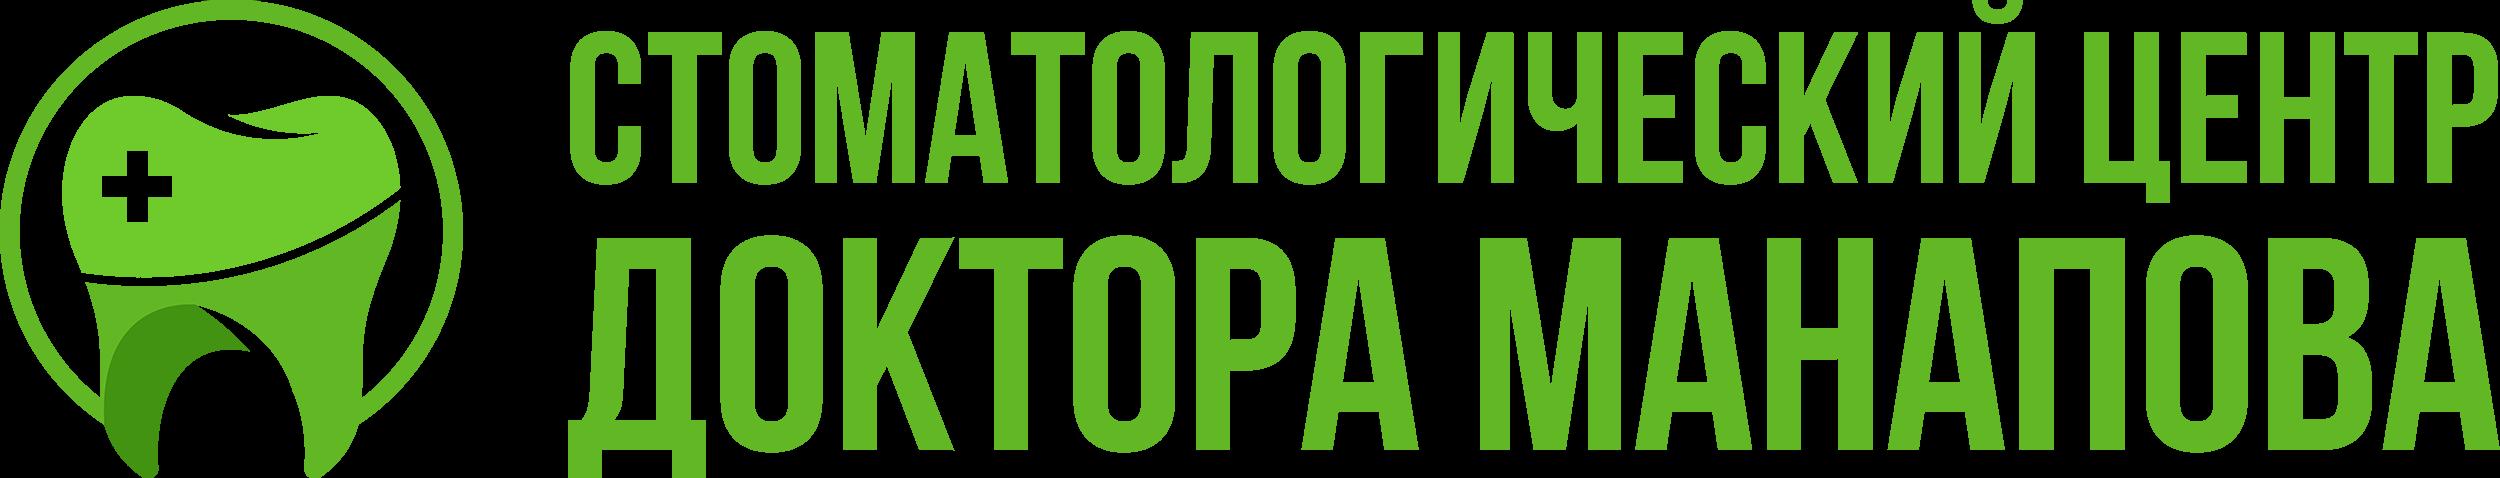 Стоматология Доктора Манапова